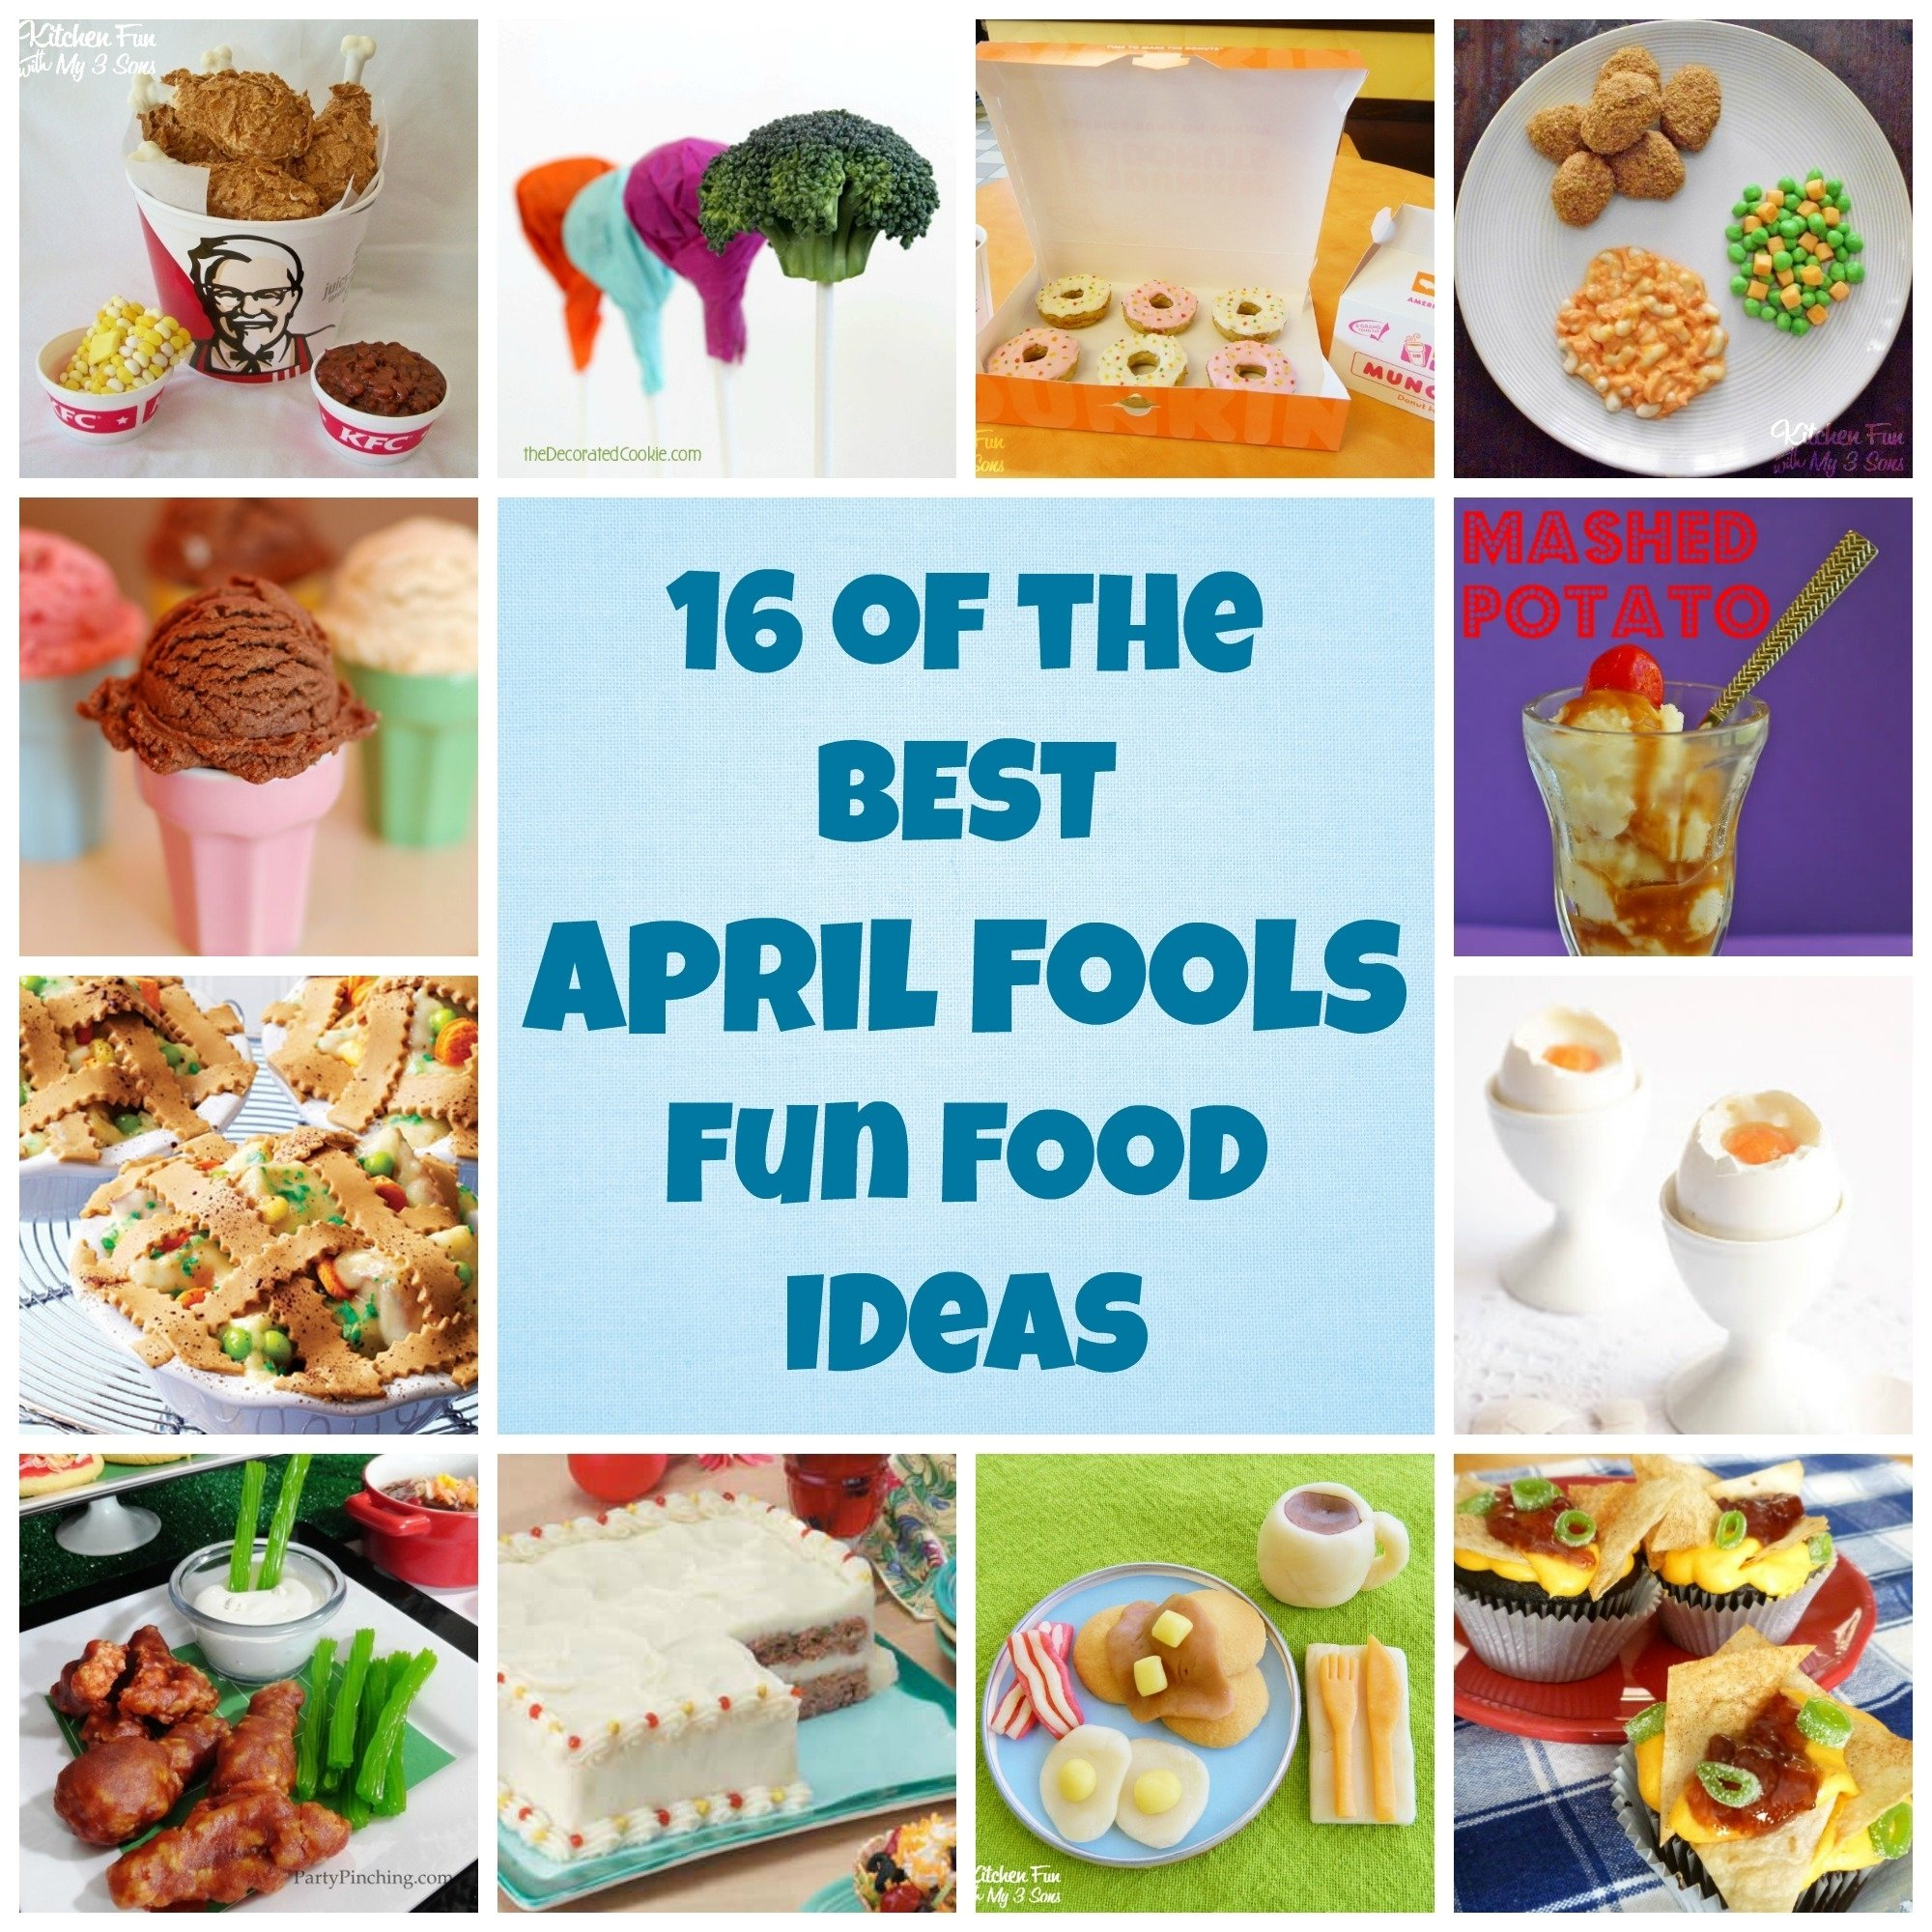 10 Fabulous Ideas For April Fools Day april fools fun food ideas